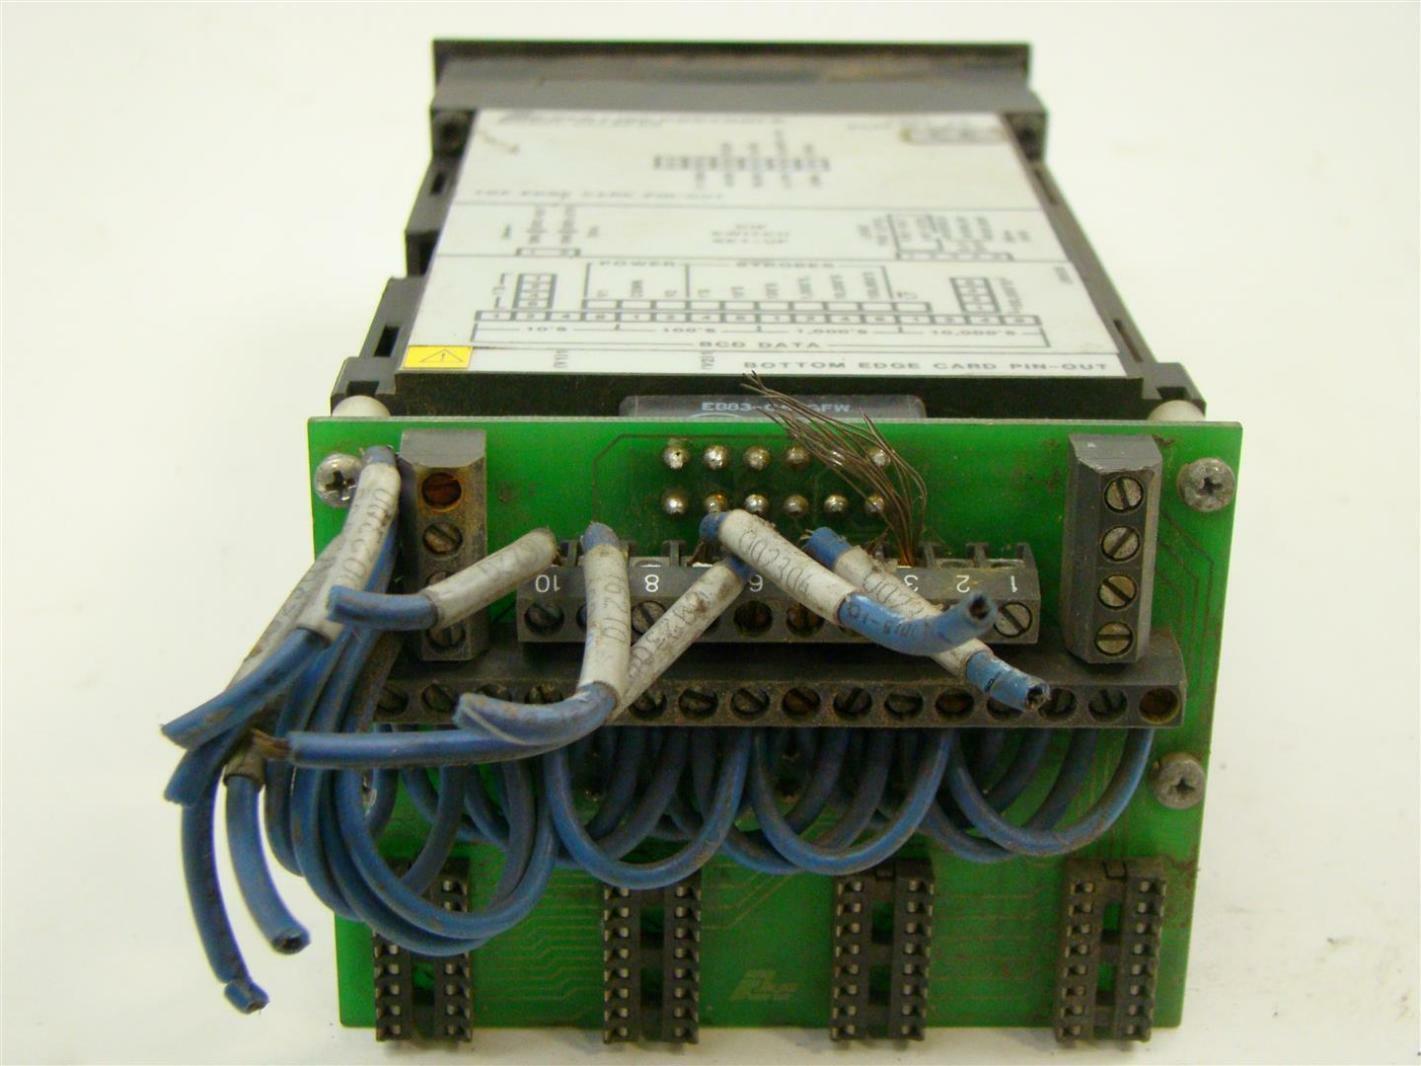 5V Subminiature Electromagnetic PCB Buzzer